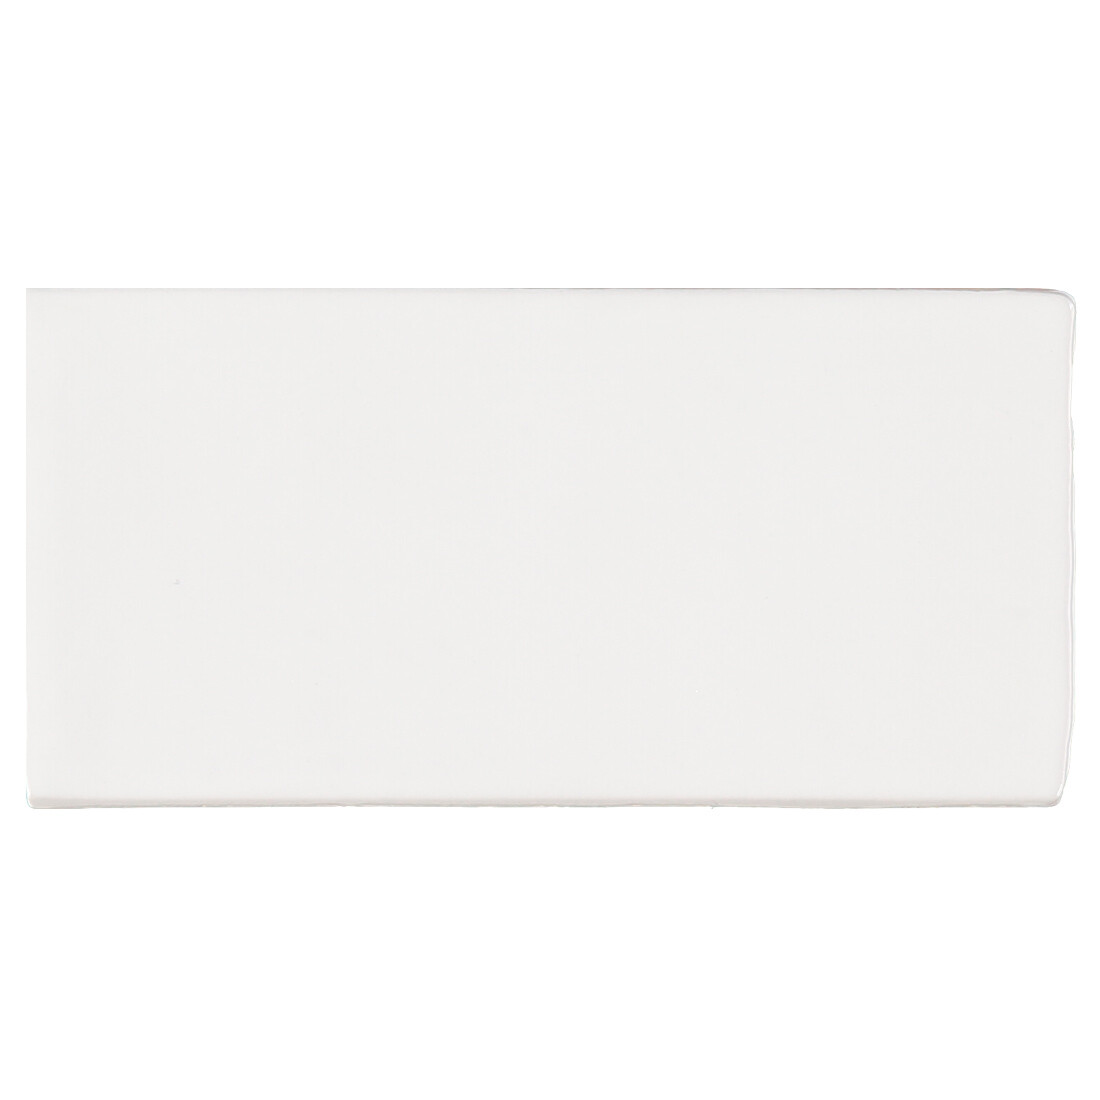 South Hampton White Gloss Handmade Look Subway 150 x 75mm